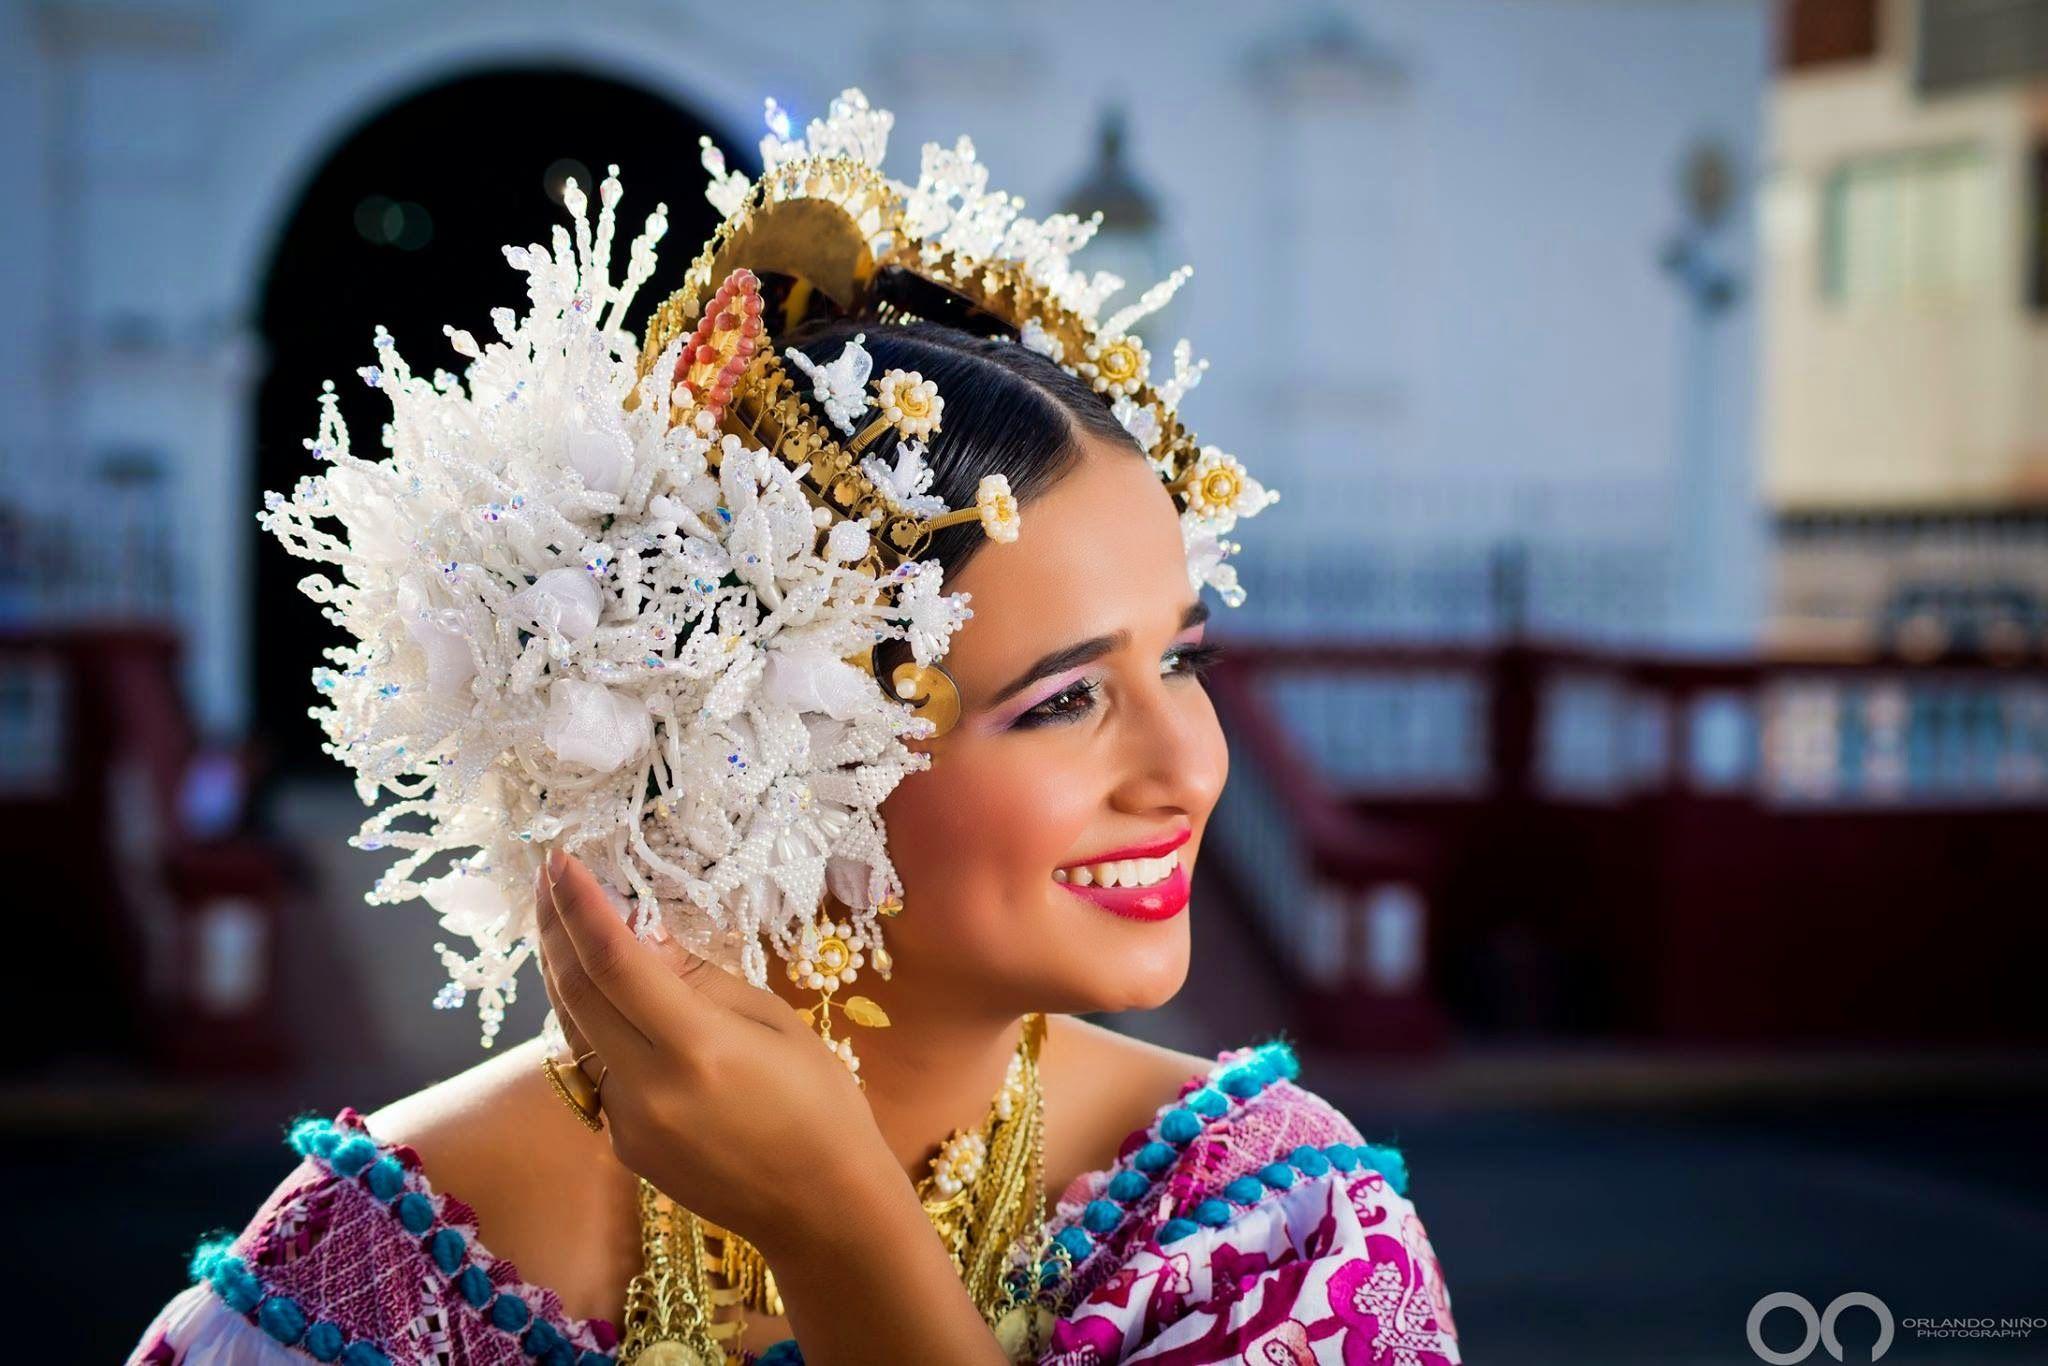 Nayleen-Quintero-Panama-Pollera Bella | Panama Culture ...